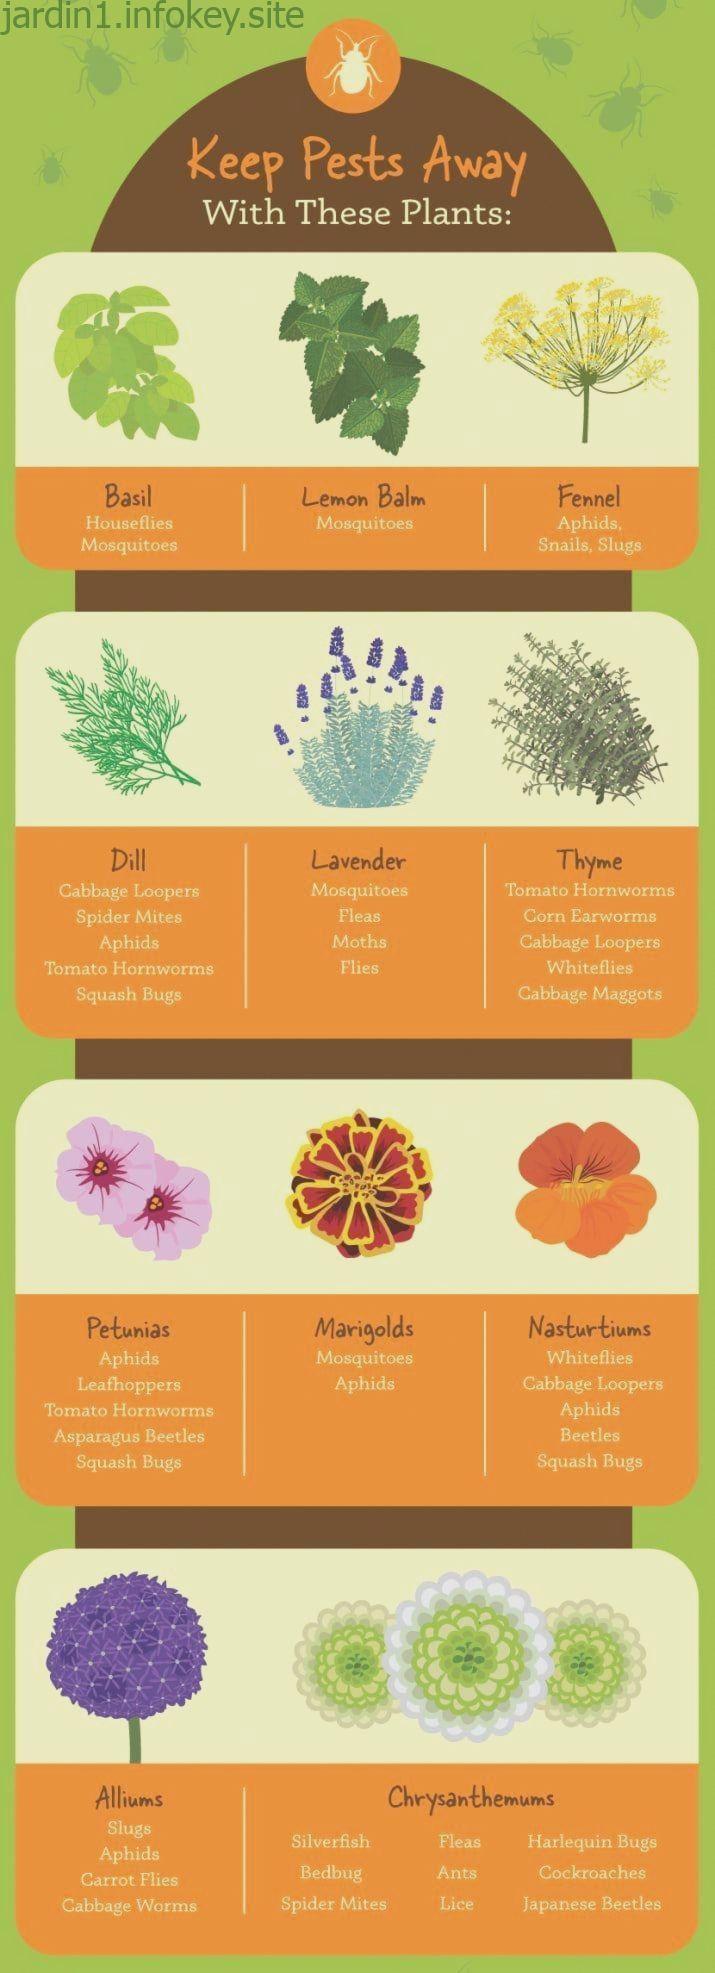 #Brassica #brune #Container Vegetable Gardening Cheat Sheets #dAsie #est # -#brassica #brune #cheat #container #dasie #est #gardening #sheets #vegetable